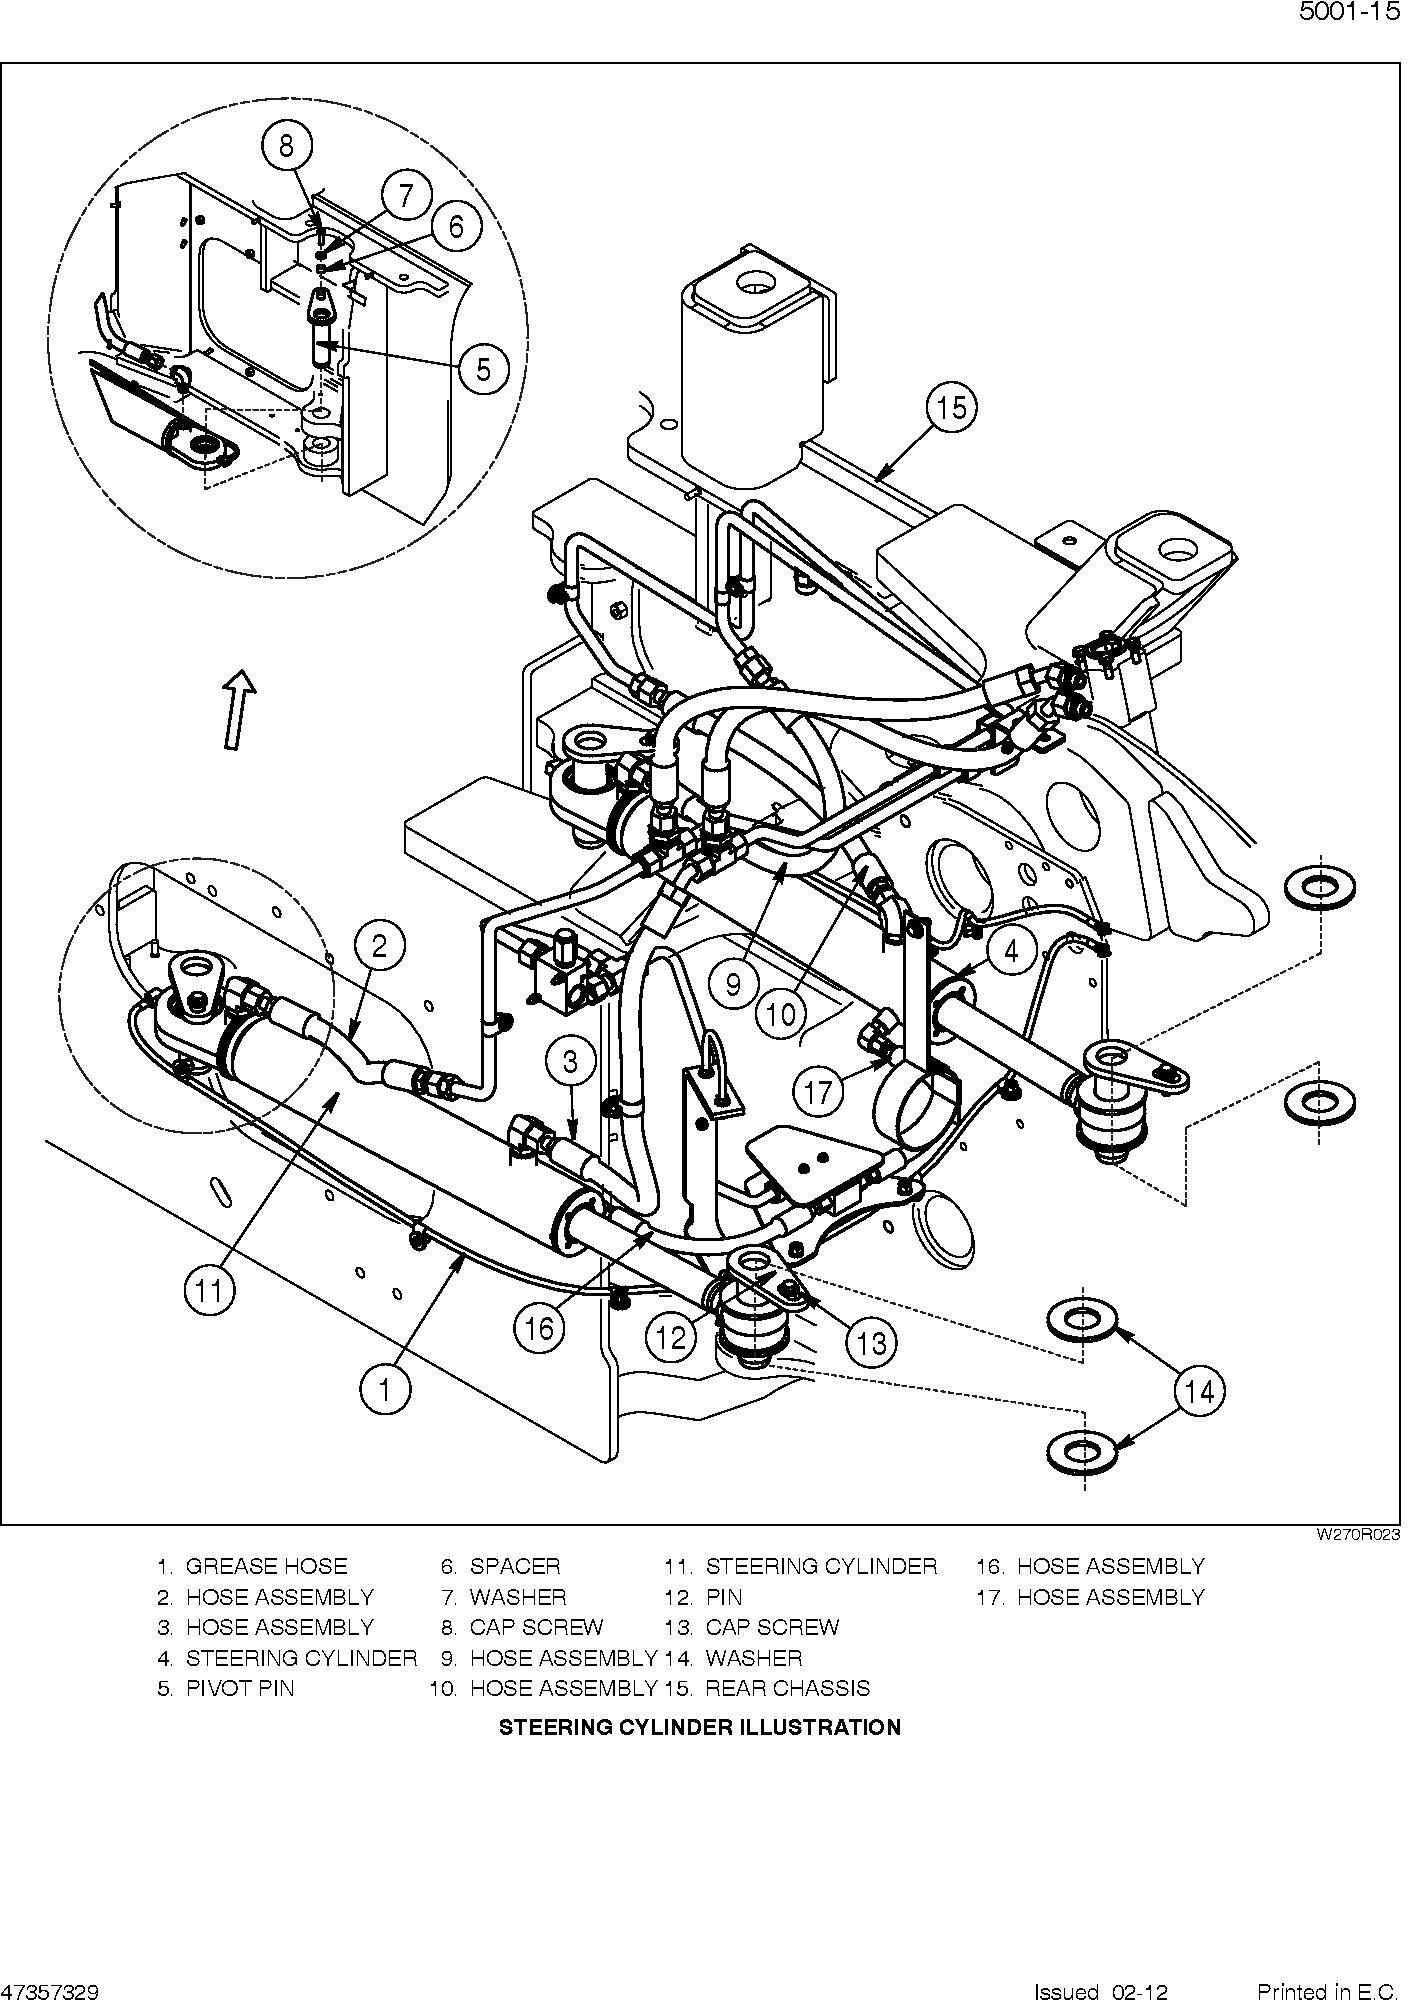 New Holland W270c W300c Tier 2 Wheel Loader Service